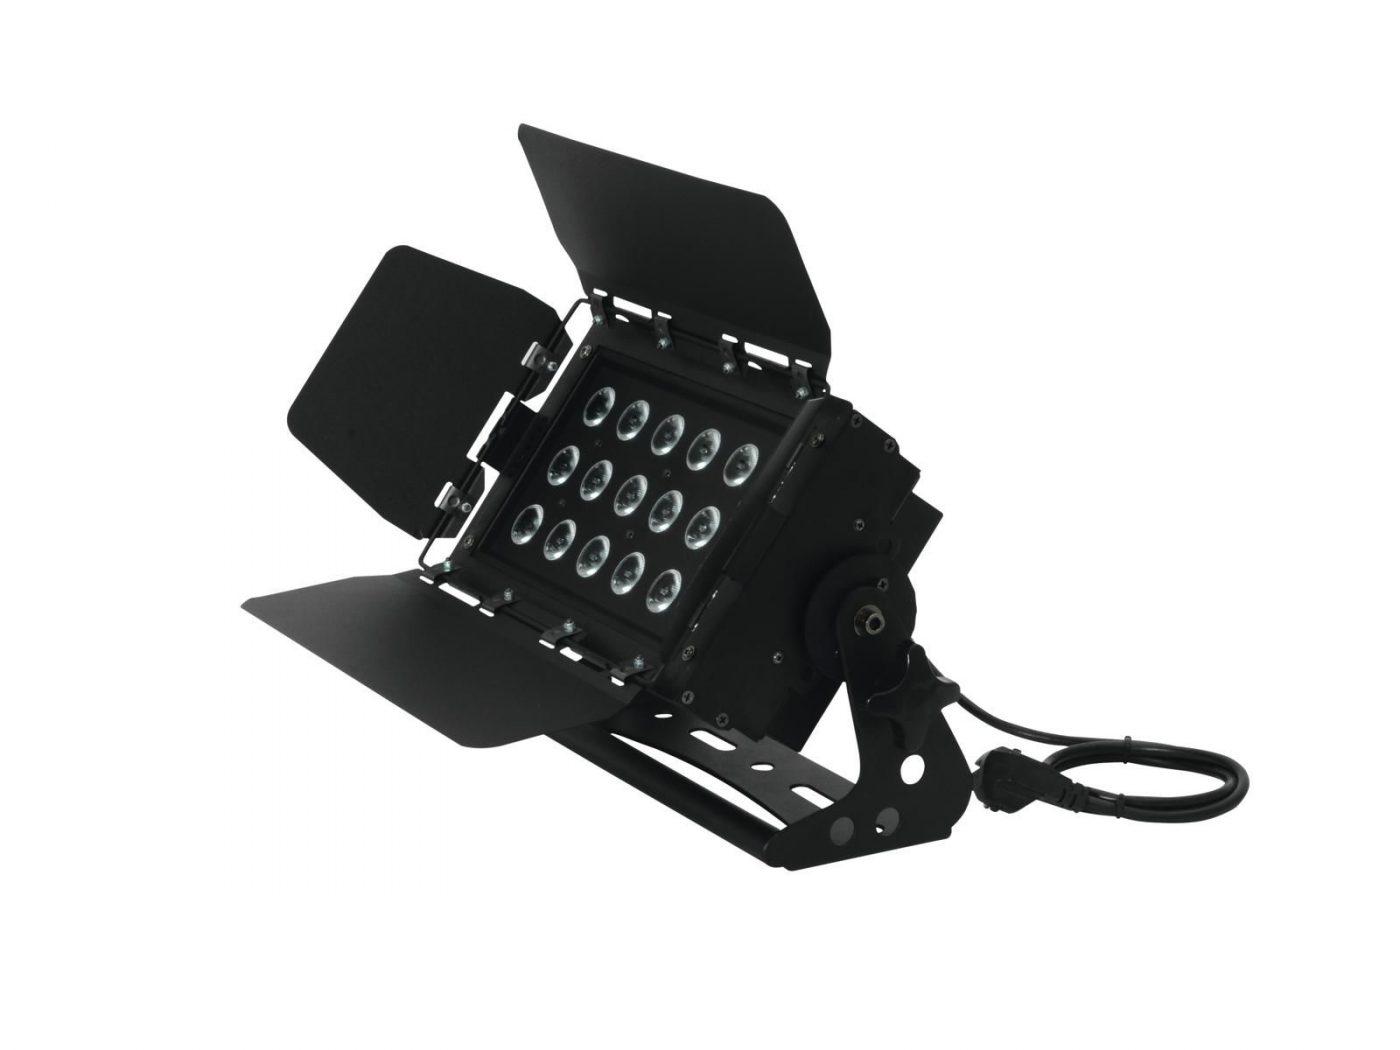 LED statická efektová – LED CLS-18 QCL RGBW 18x8W Eurolite